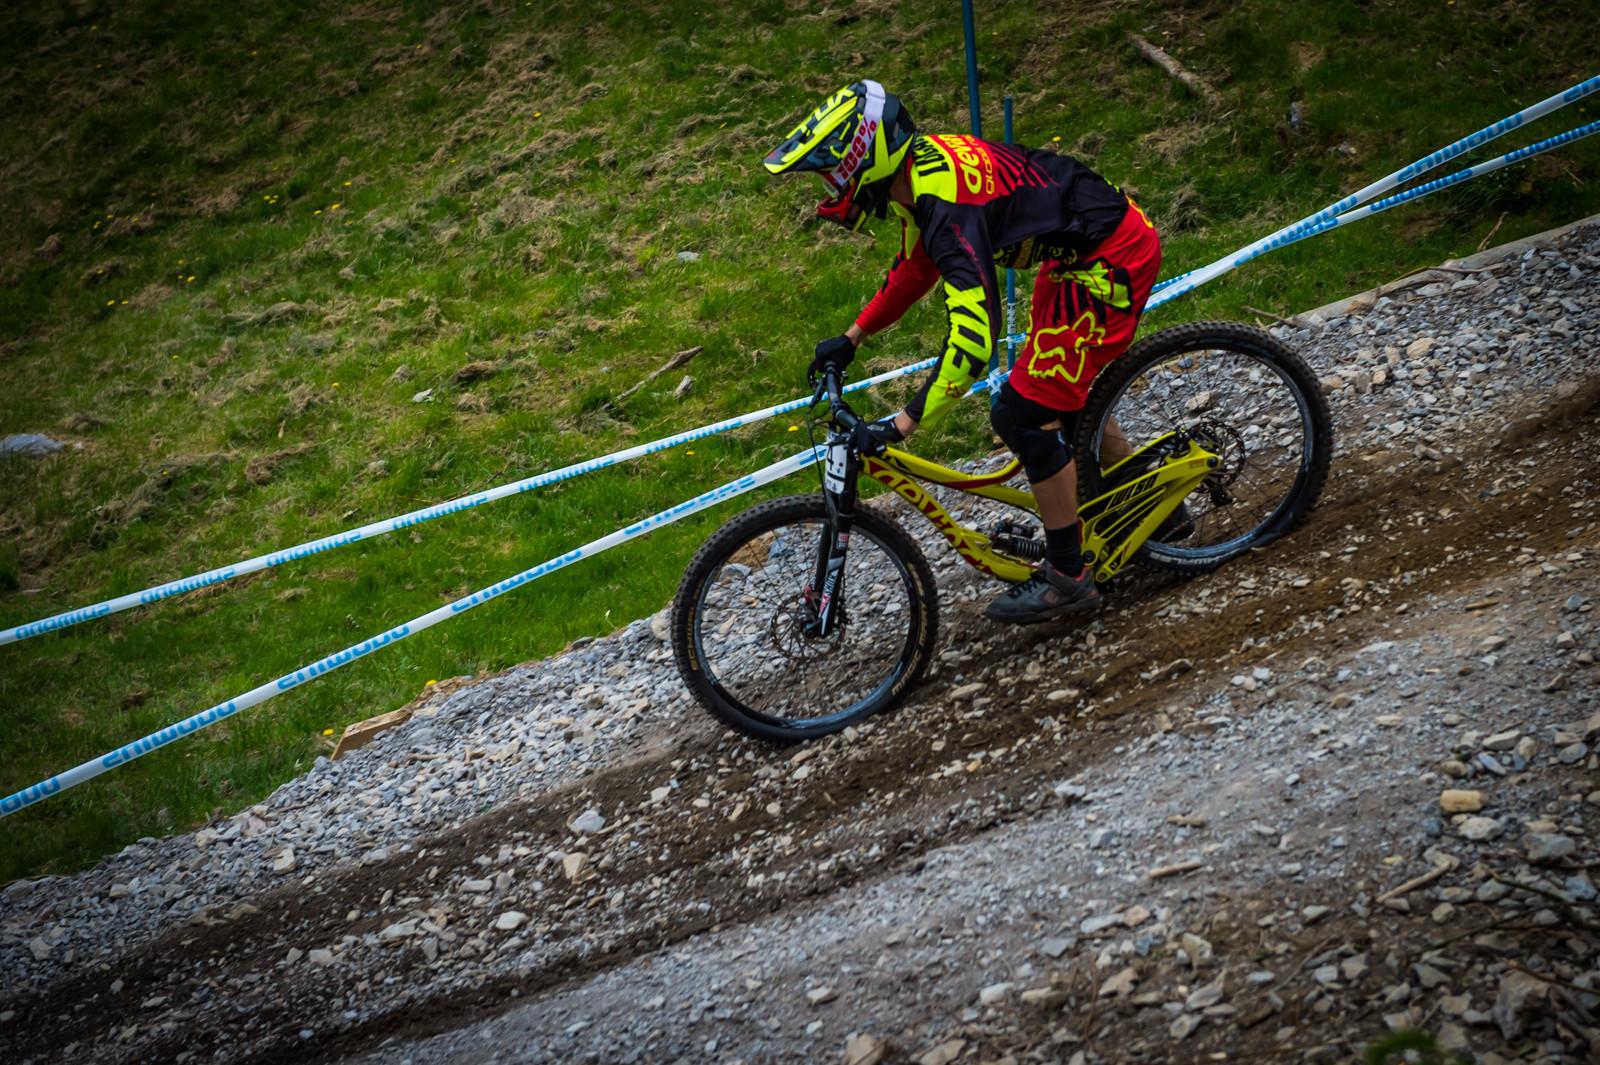 Dean Lucas G-Out Project - Lourdes World Cup - G-Out Project - Lourdes World Cup - Mountain Biking Pictures - Vital MTB